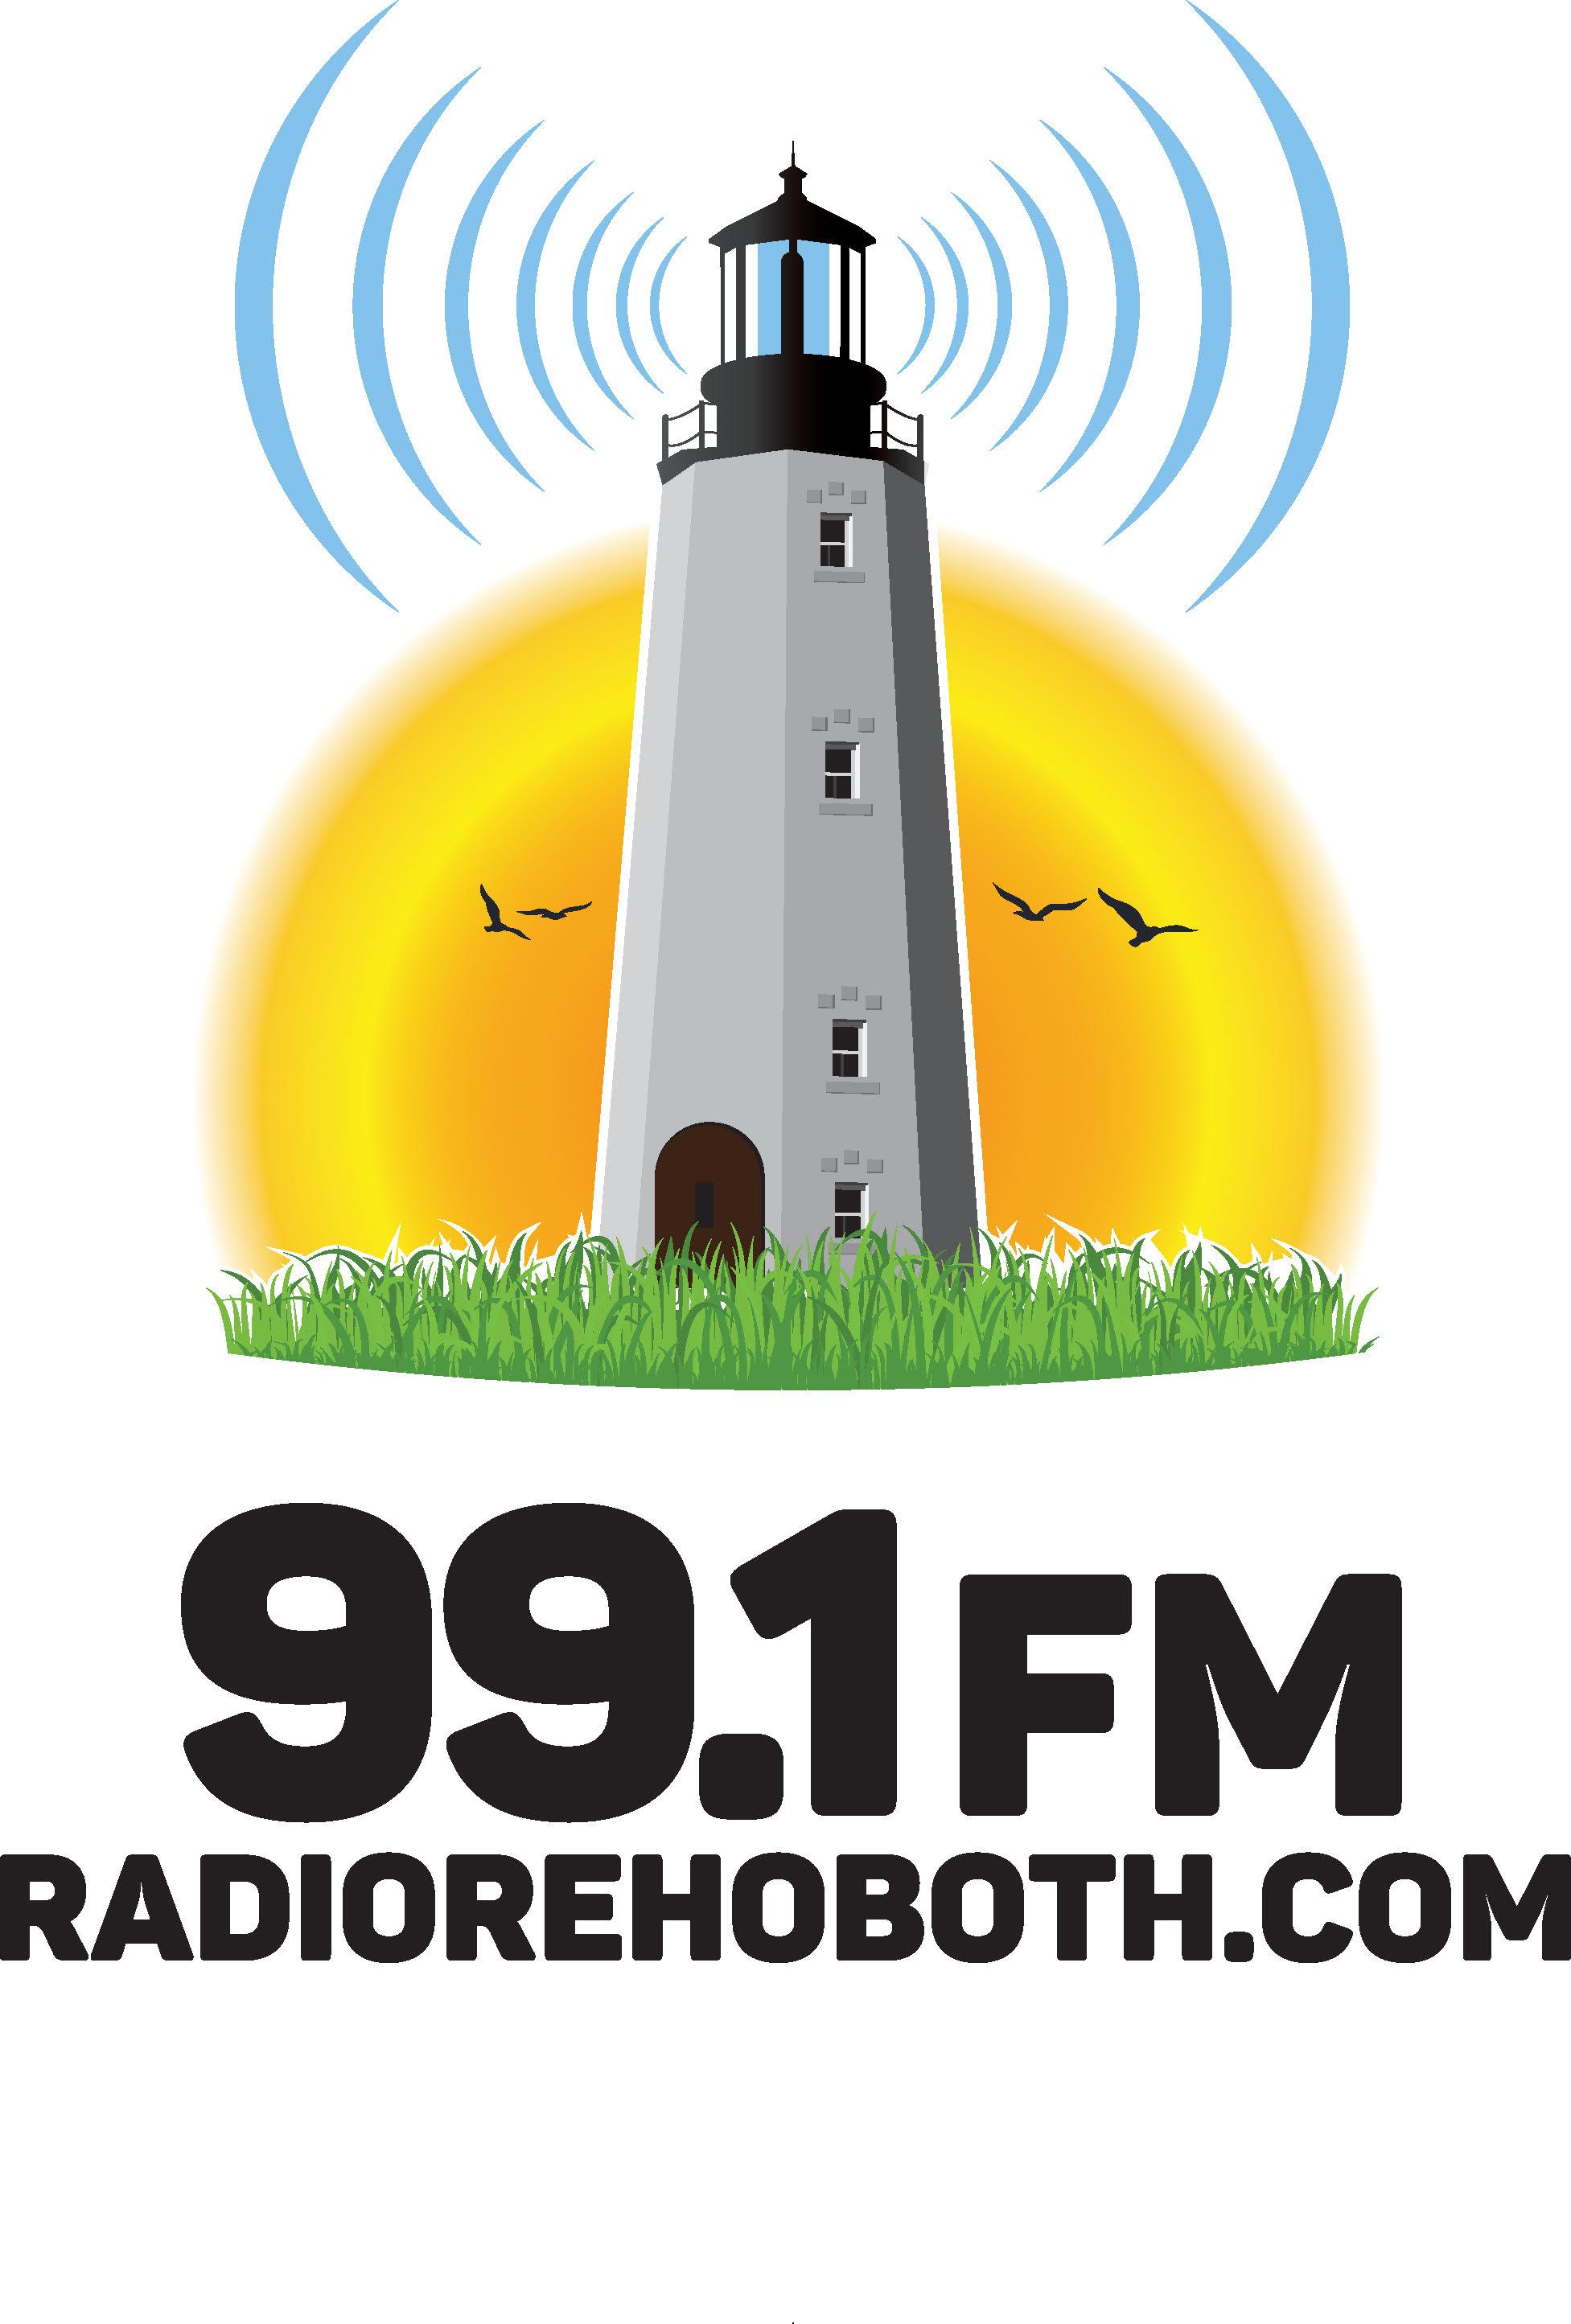 Radio Rehoboth